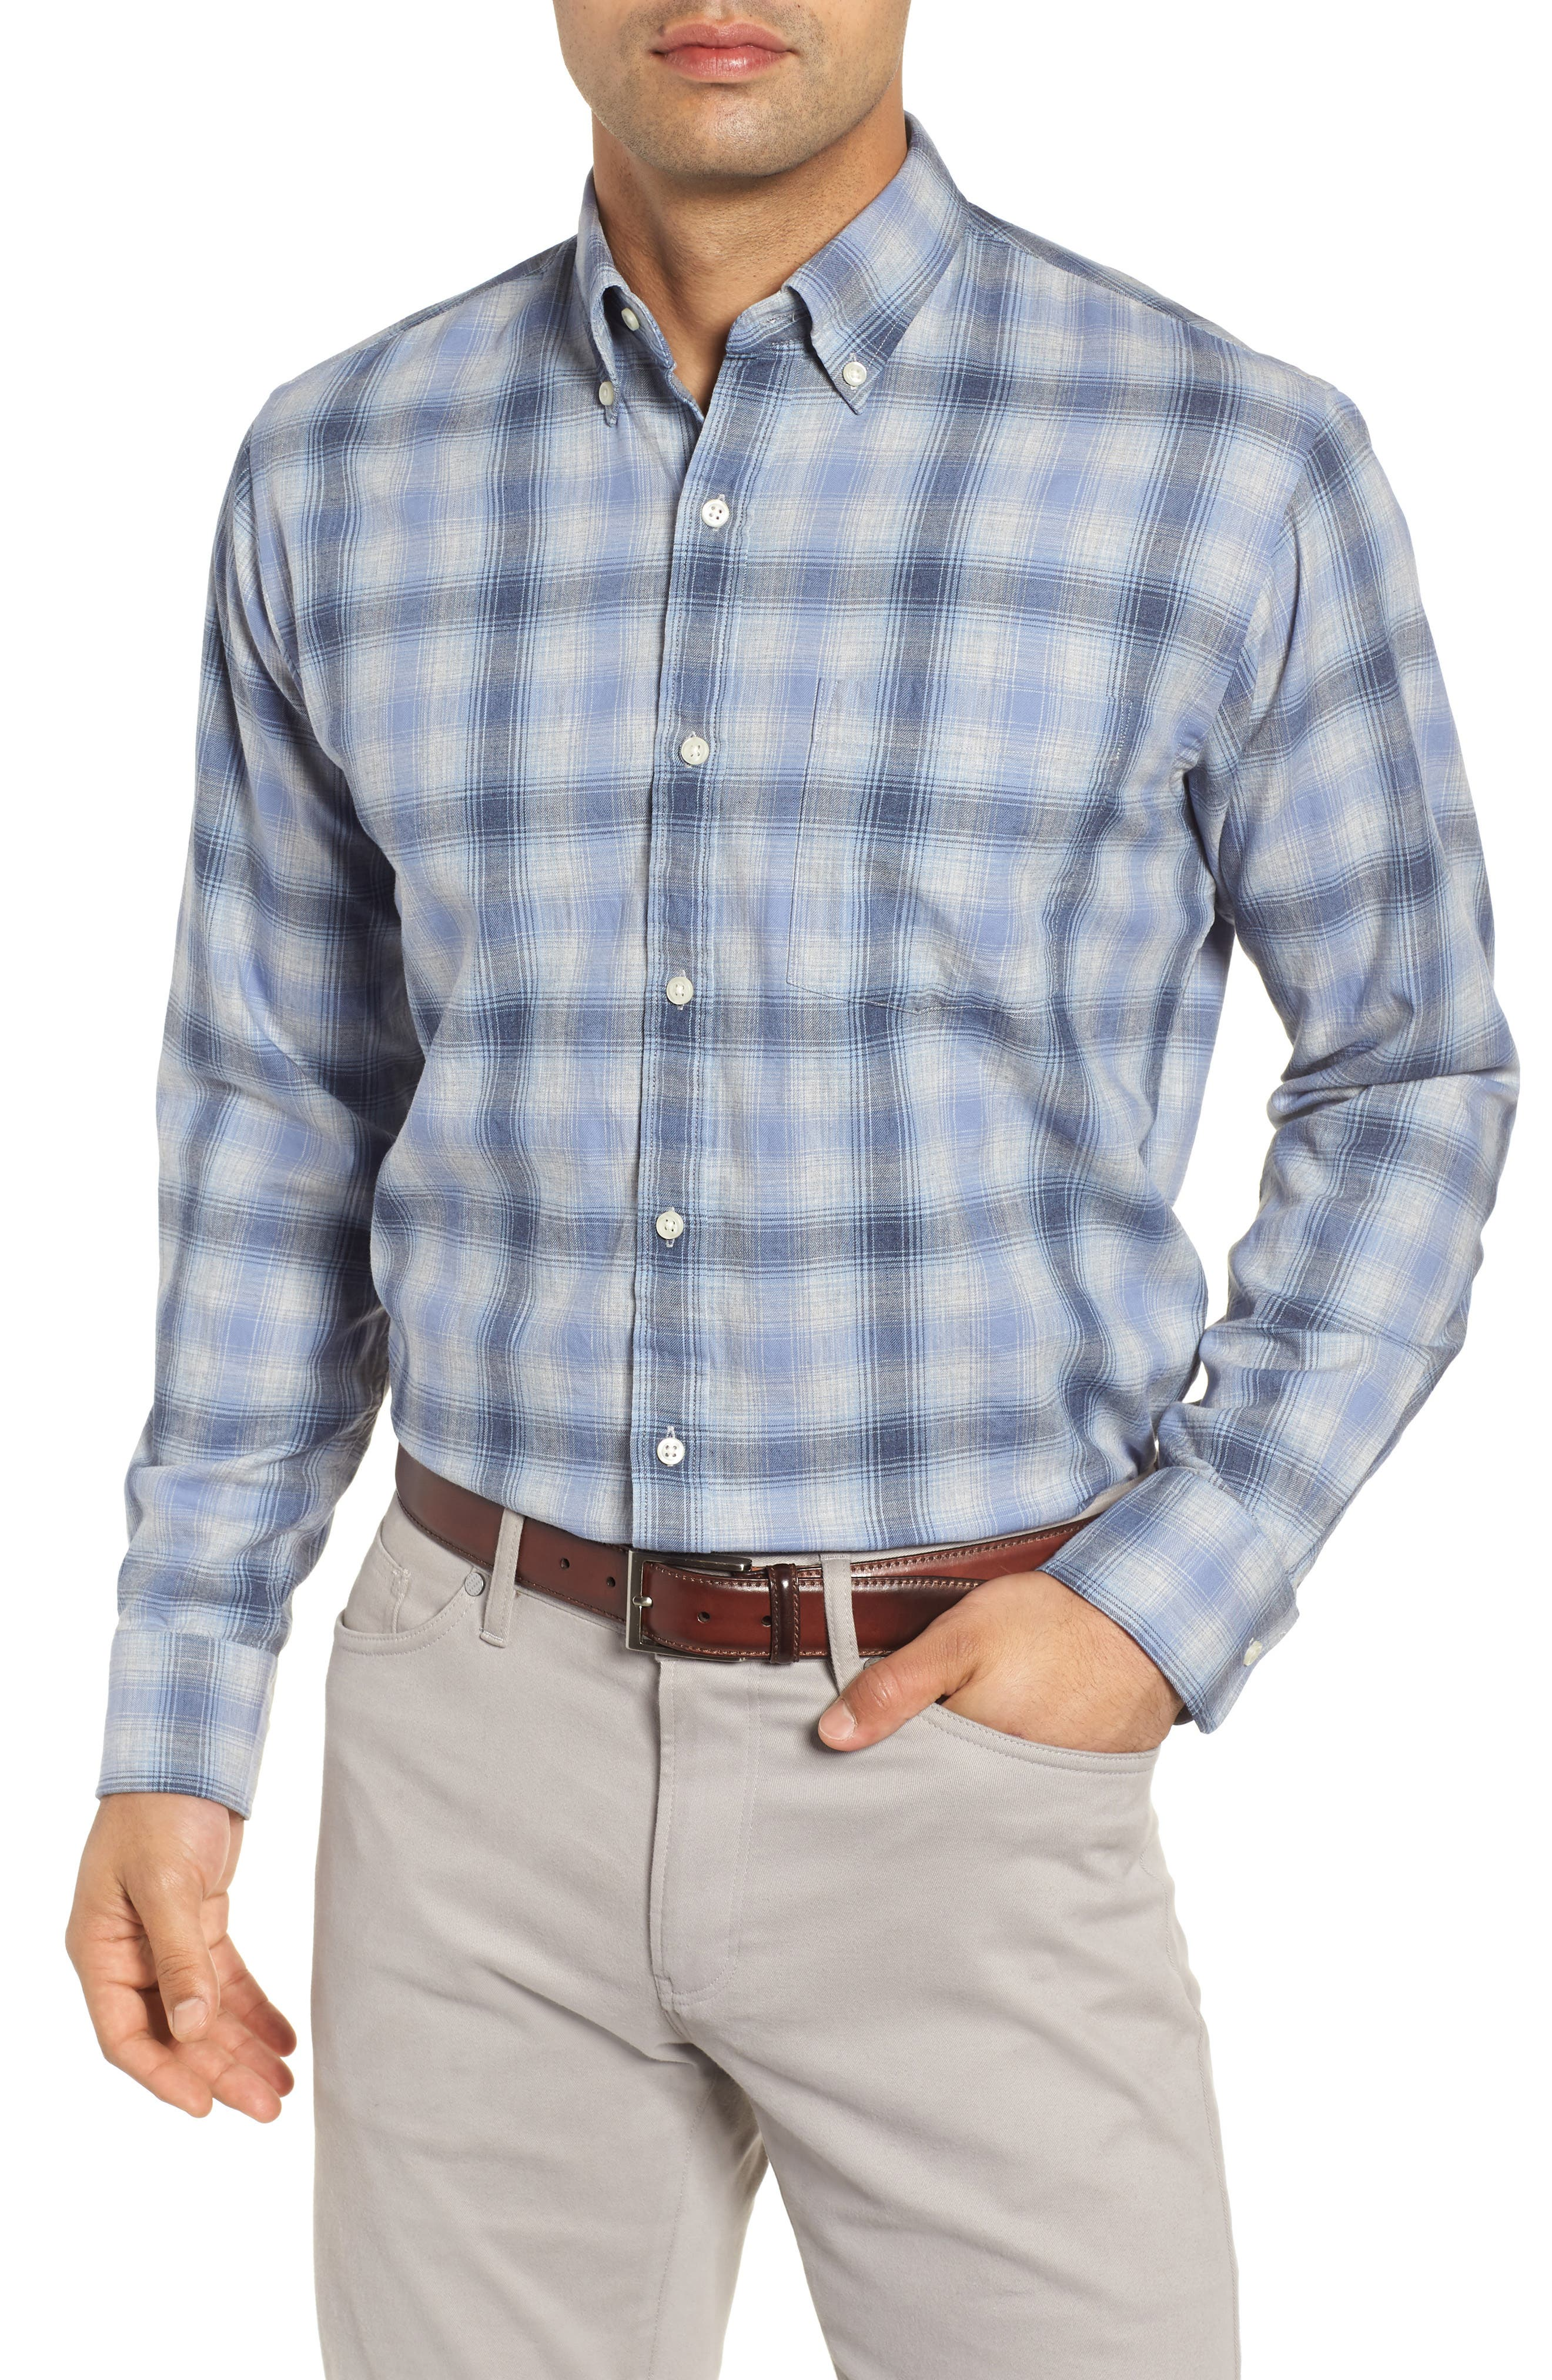 Mountain Fog Plaid Sport Shirt,                         Main,                         color, ATLANTIC BLUE